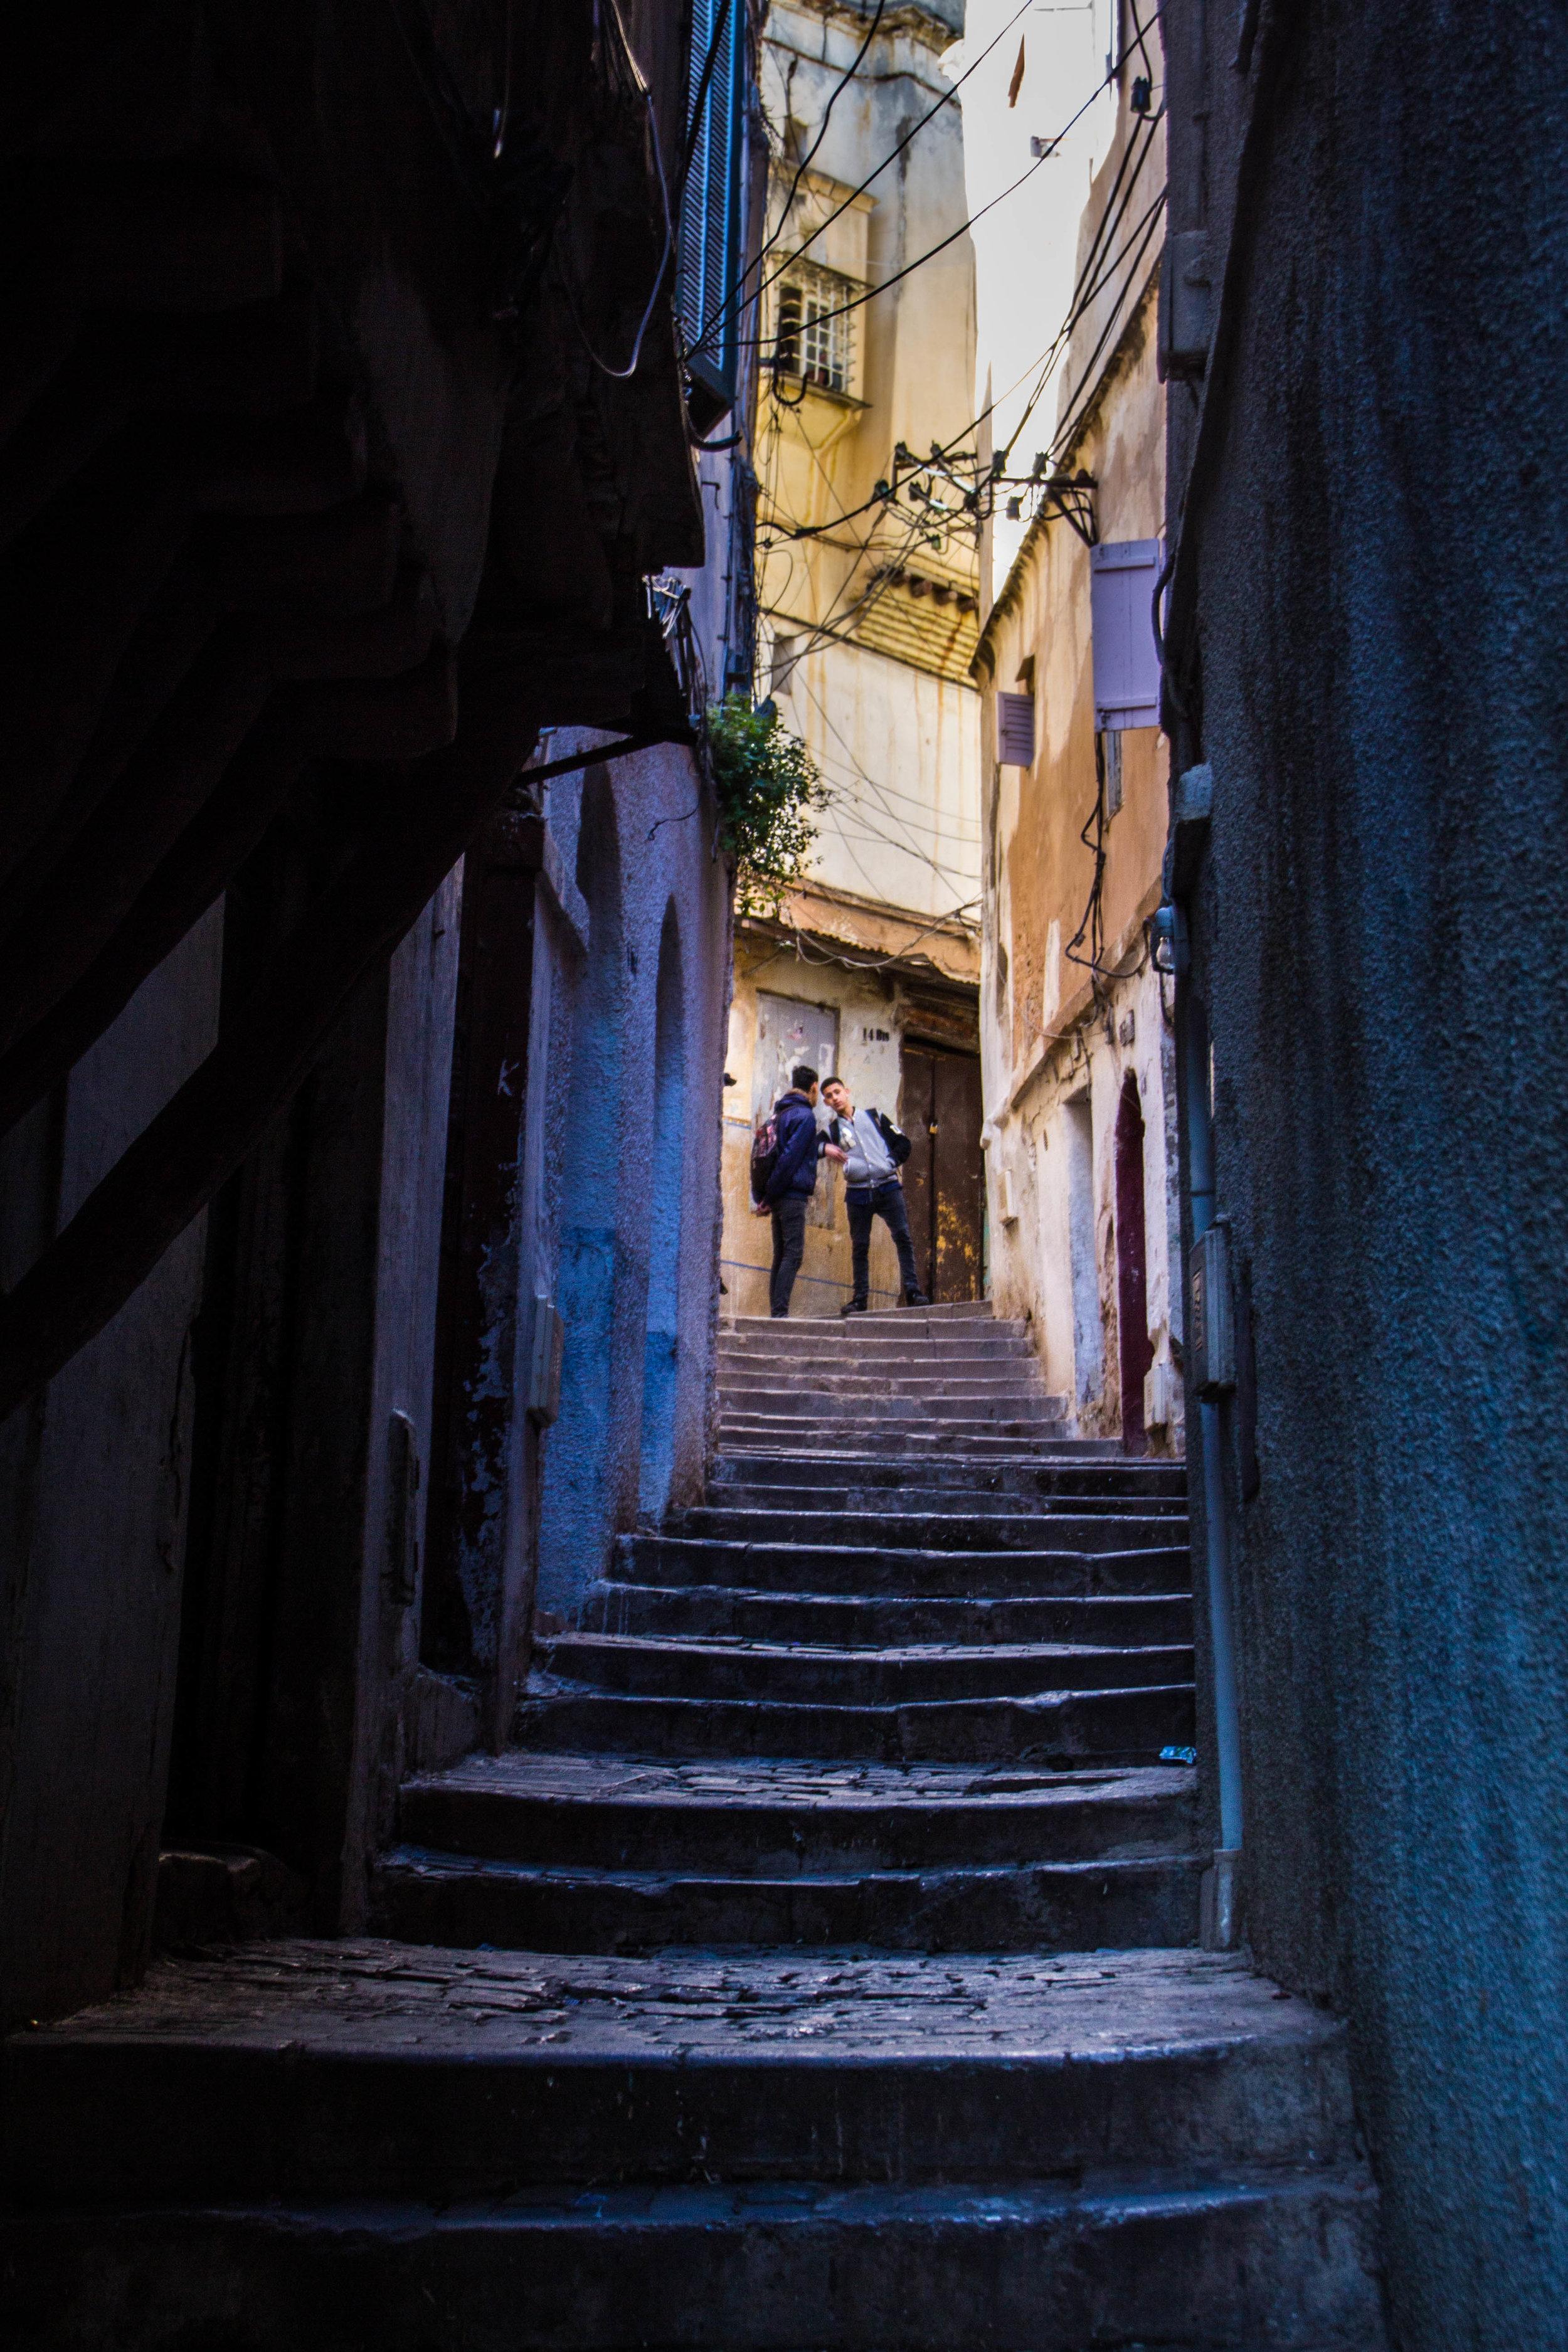 casbah-photography-algiers-algeria-alger-20.jpg